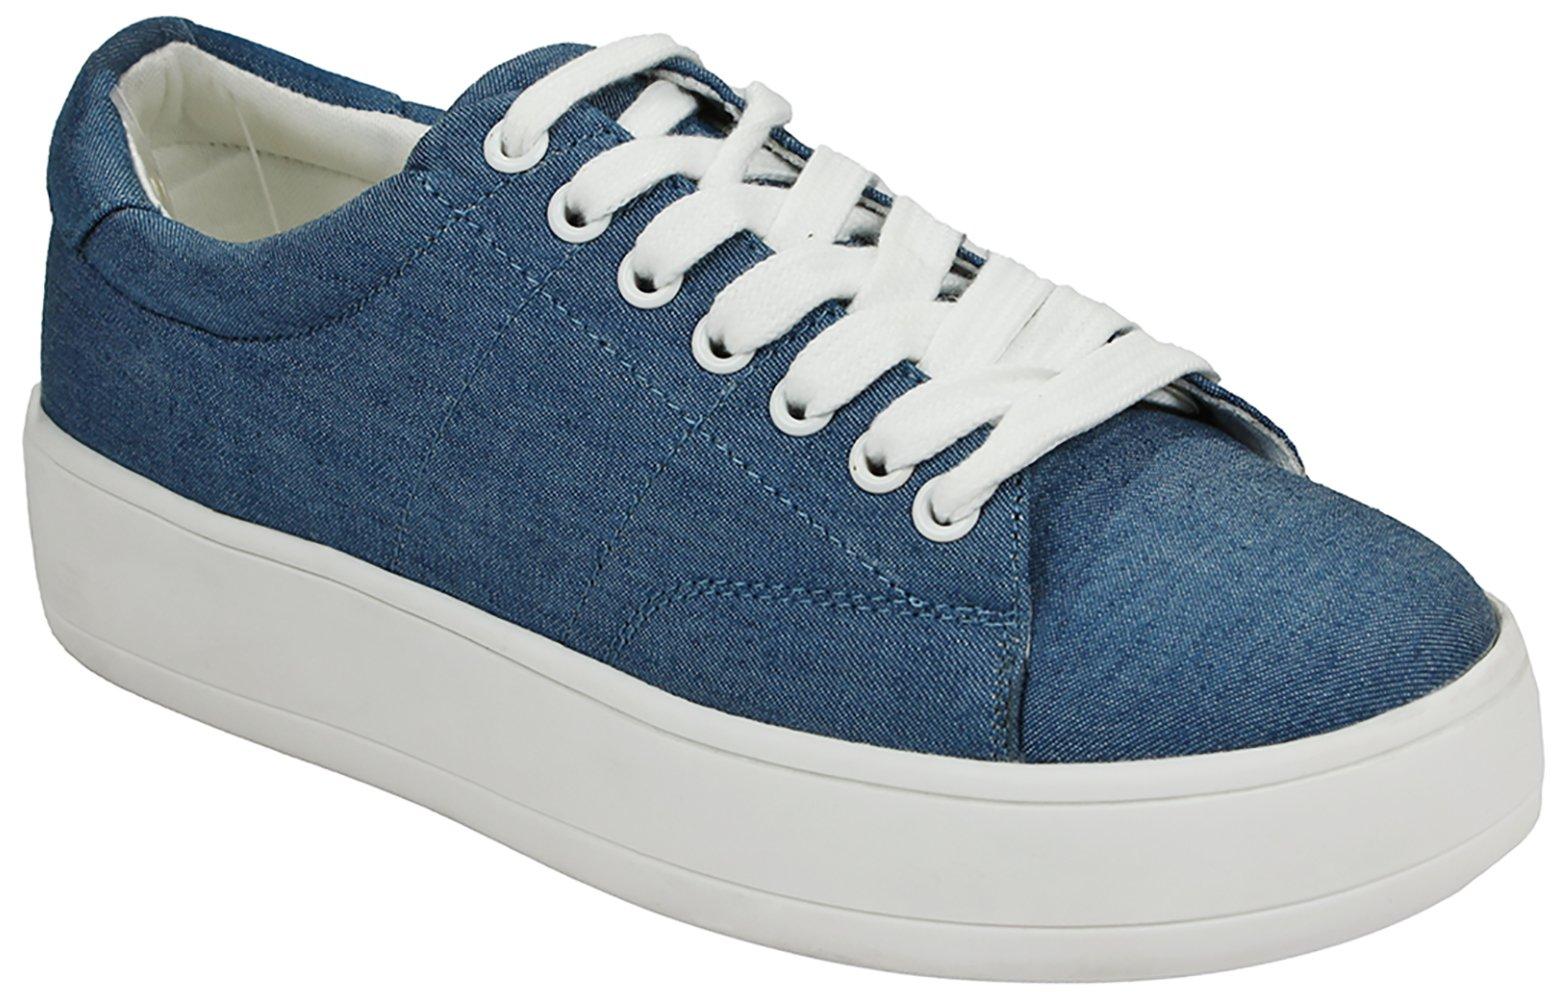 Women Teresa Blue Denim Fashion Lace-Up Lace-Up Rubber Thick Platform Sole Sneakers-8.5